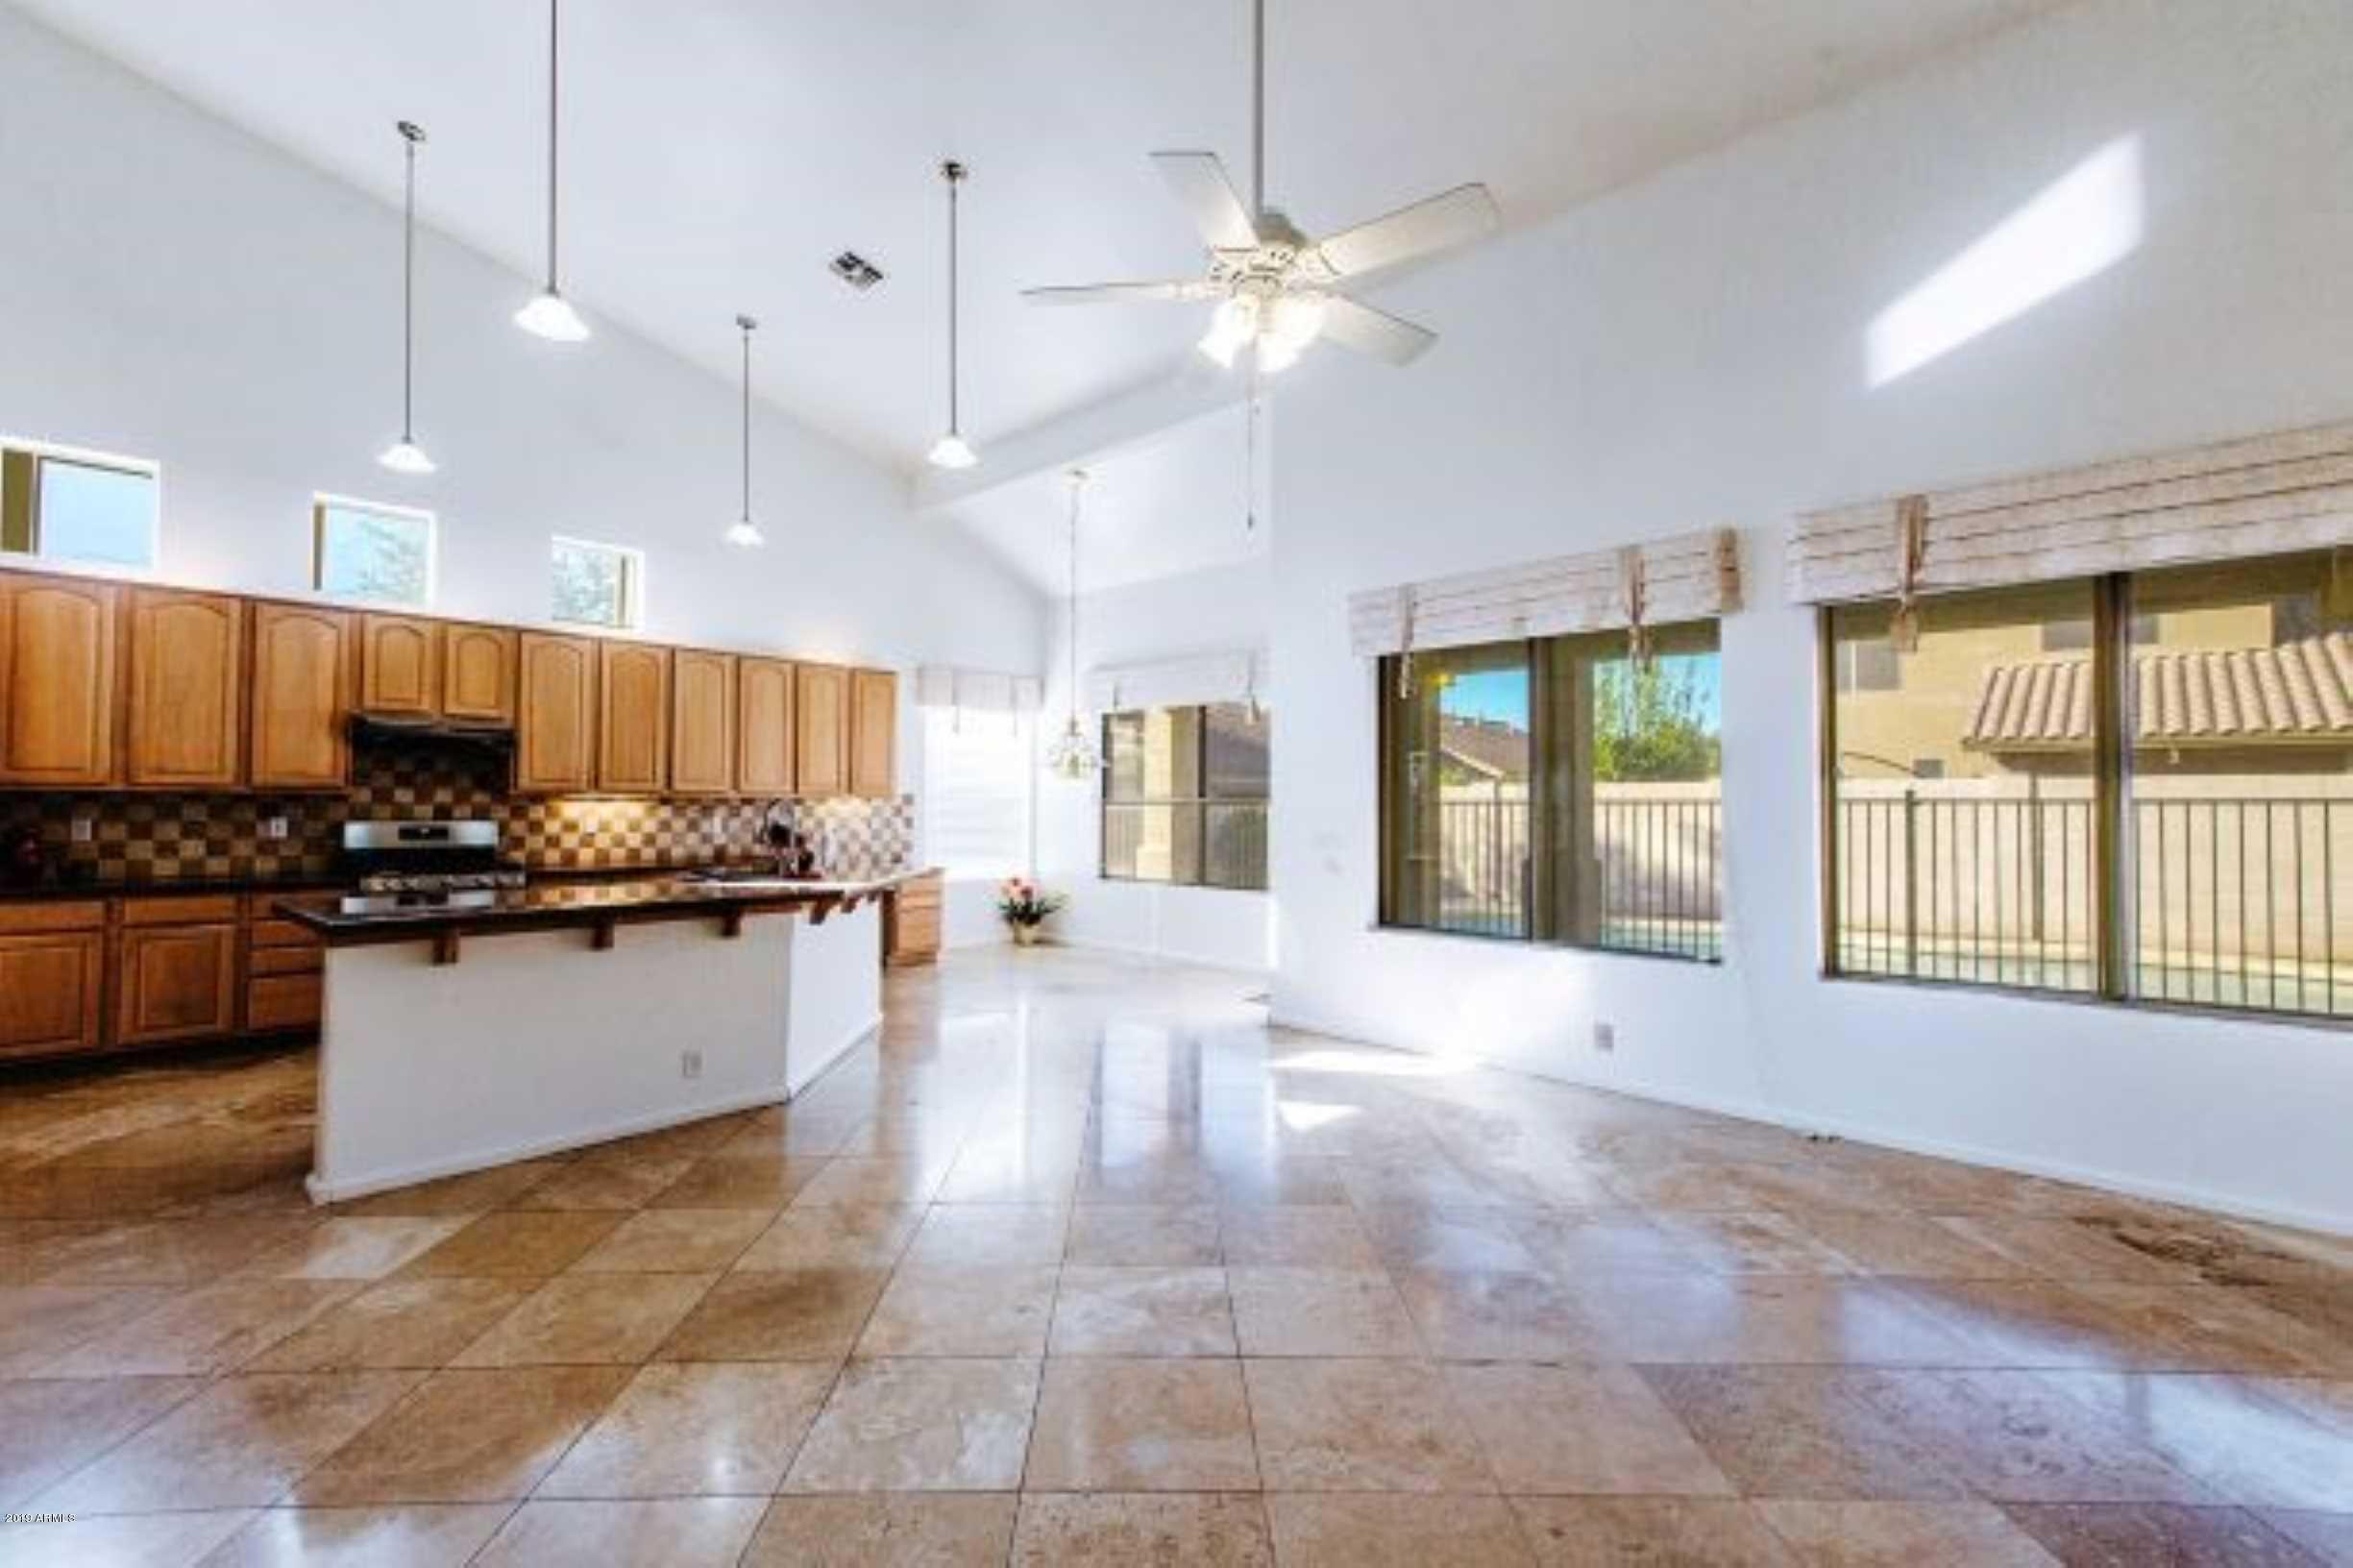 $514,800 - 5Br/3Ba - Home for Sale in Coppercrest, Glendale